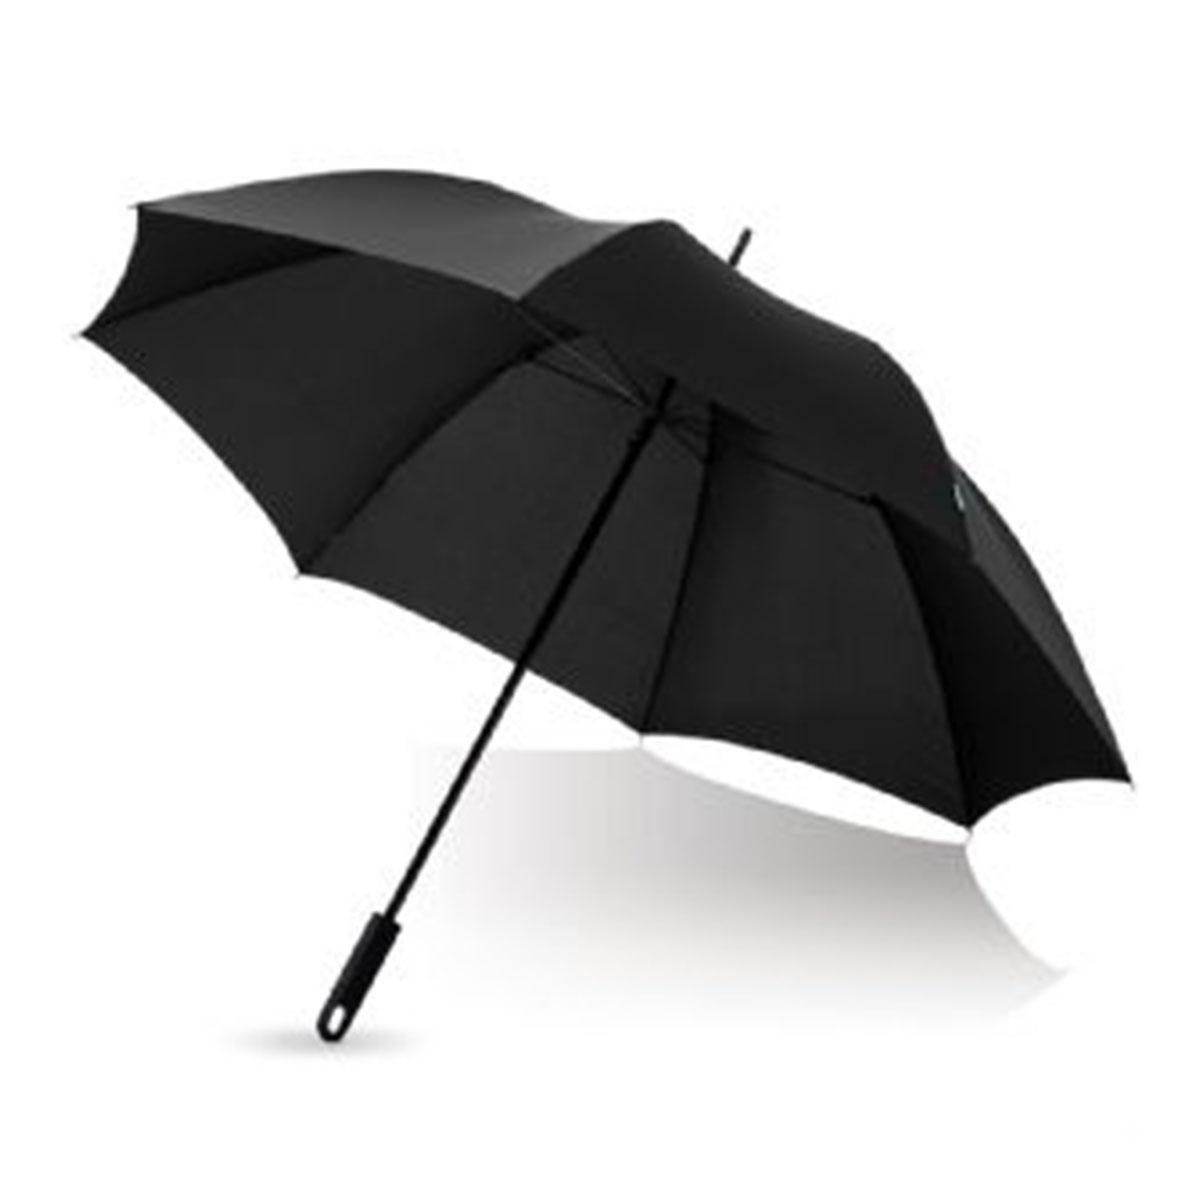 Marksman 30 inch Halo Umbrella-Black